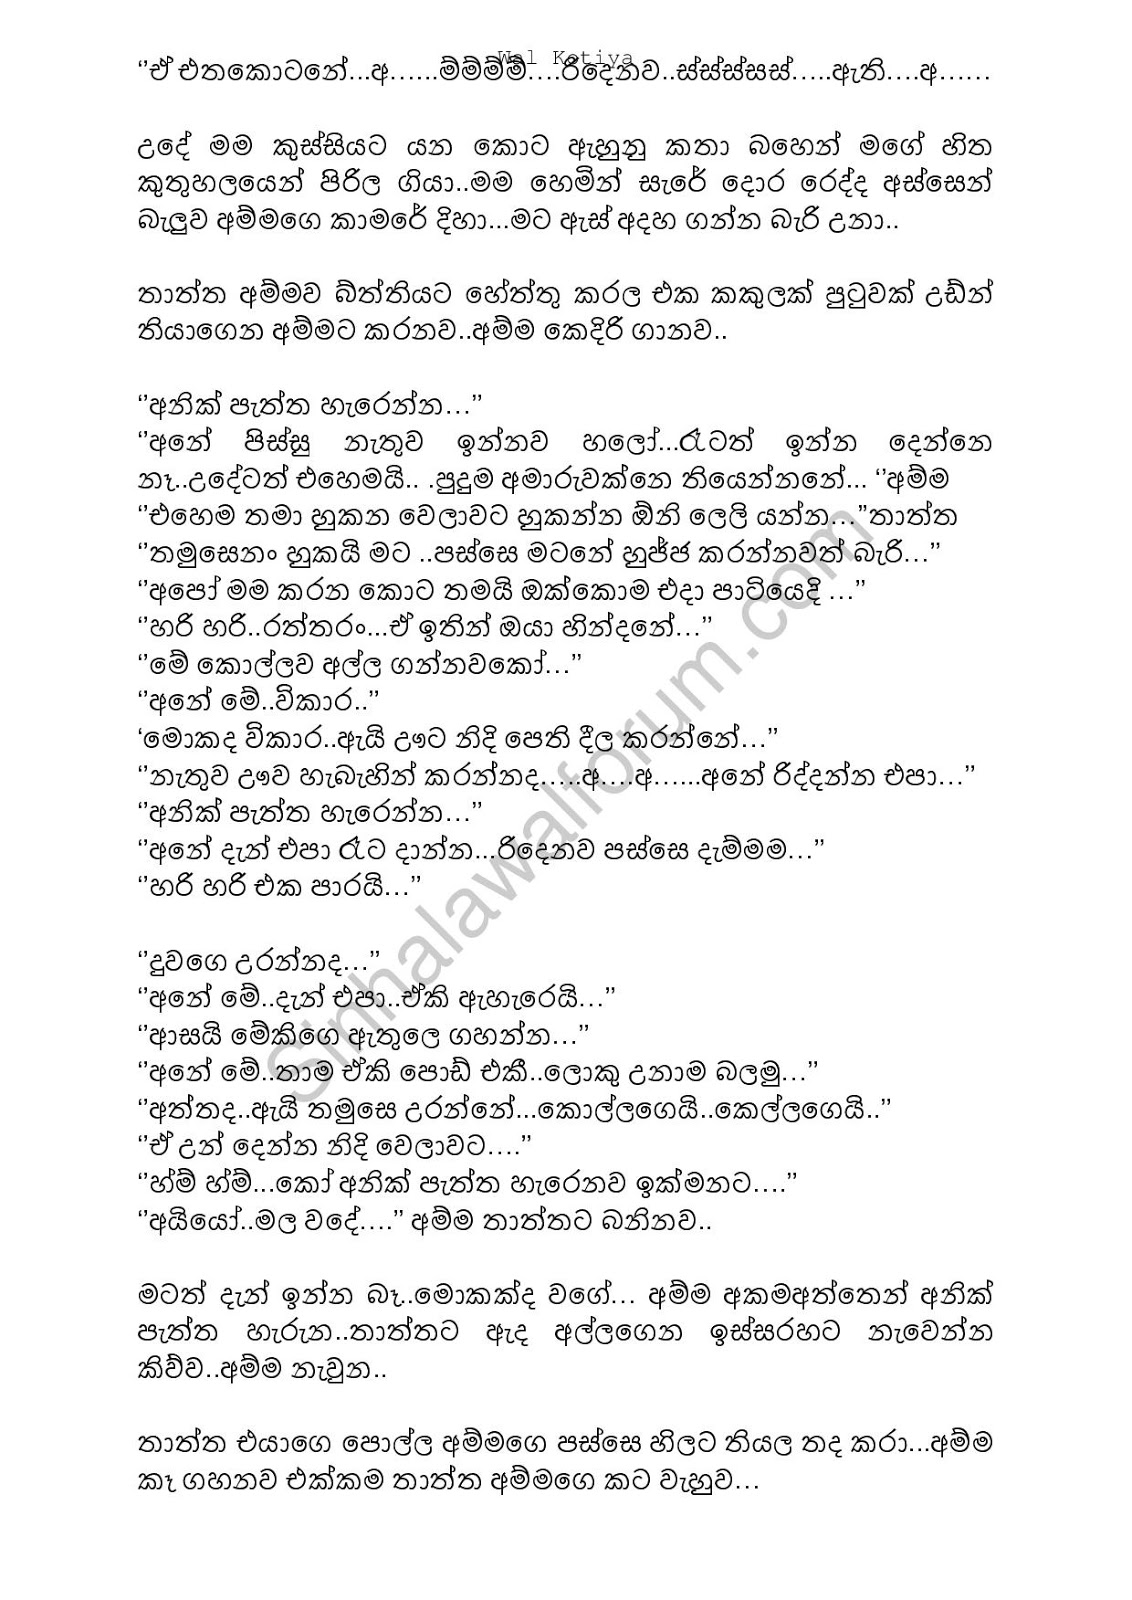 Manglish Kambi Kathakal Amma Magan Wiring Library Jackson Cvr Humbucker Diagram Vittil Kuttanennu Vilikkum Pdf Hot Call Kochupusthakam Tution Kampi Viswaraj Pooru